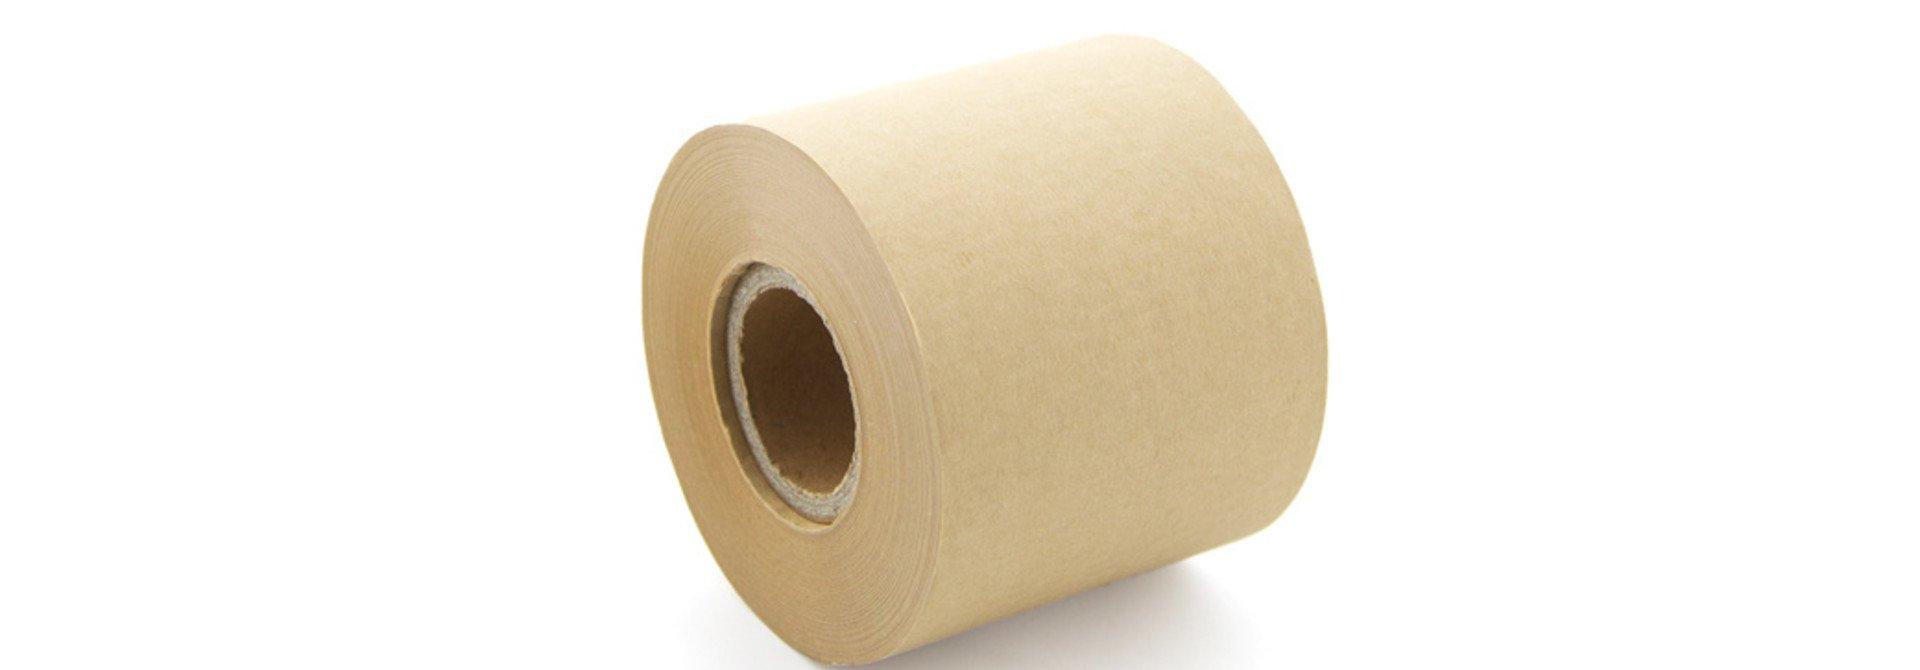 Refill Papier rol S